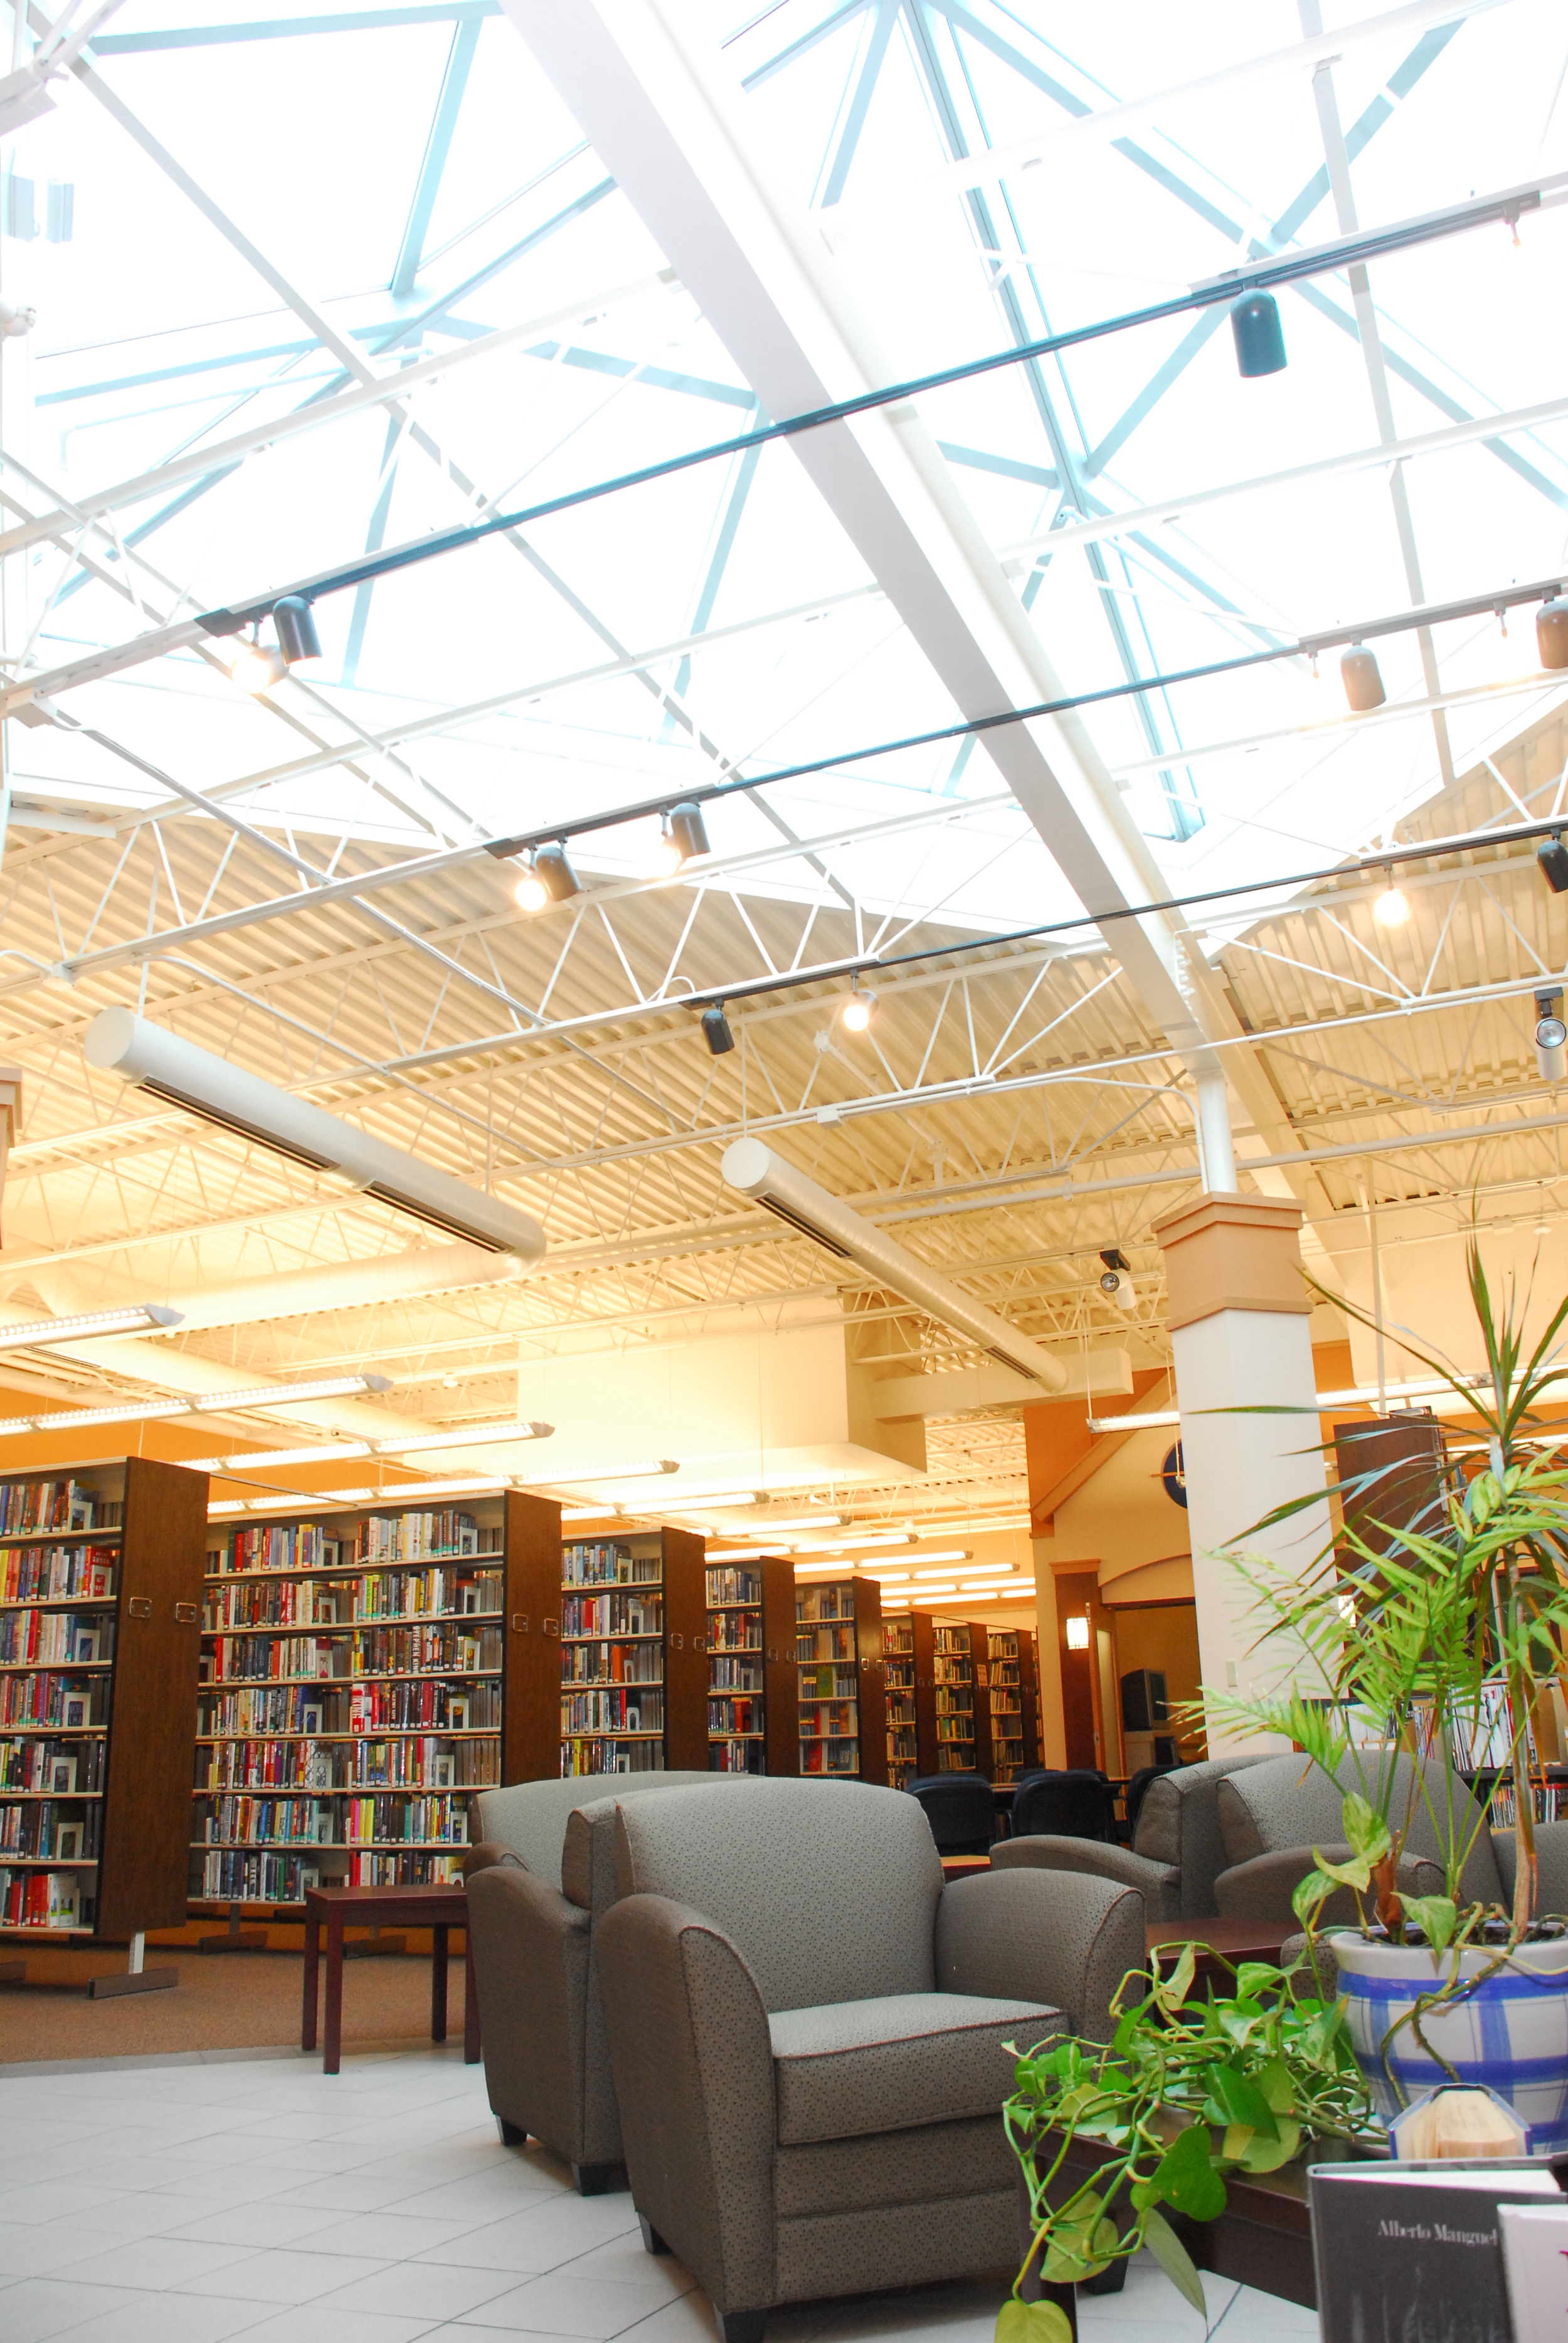 Ellwood City Public Library, Ellwood City, PA (interior)